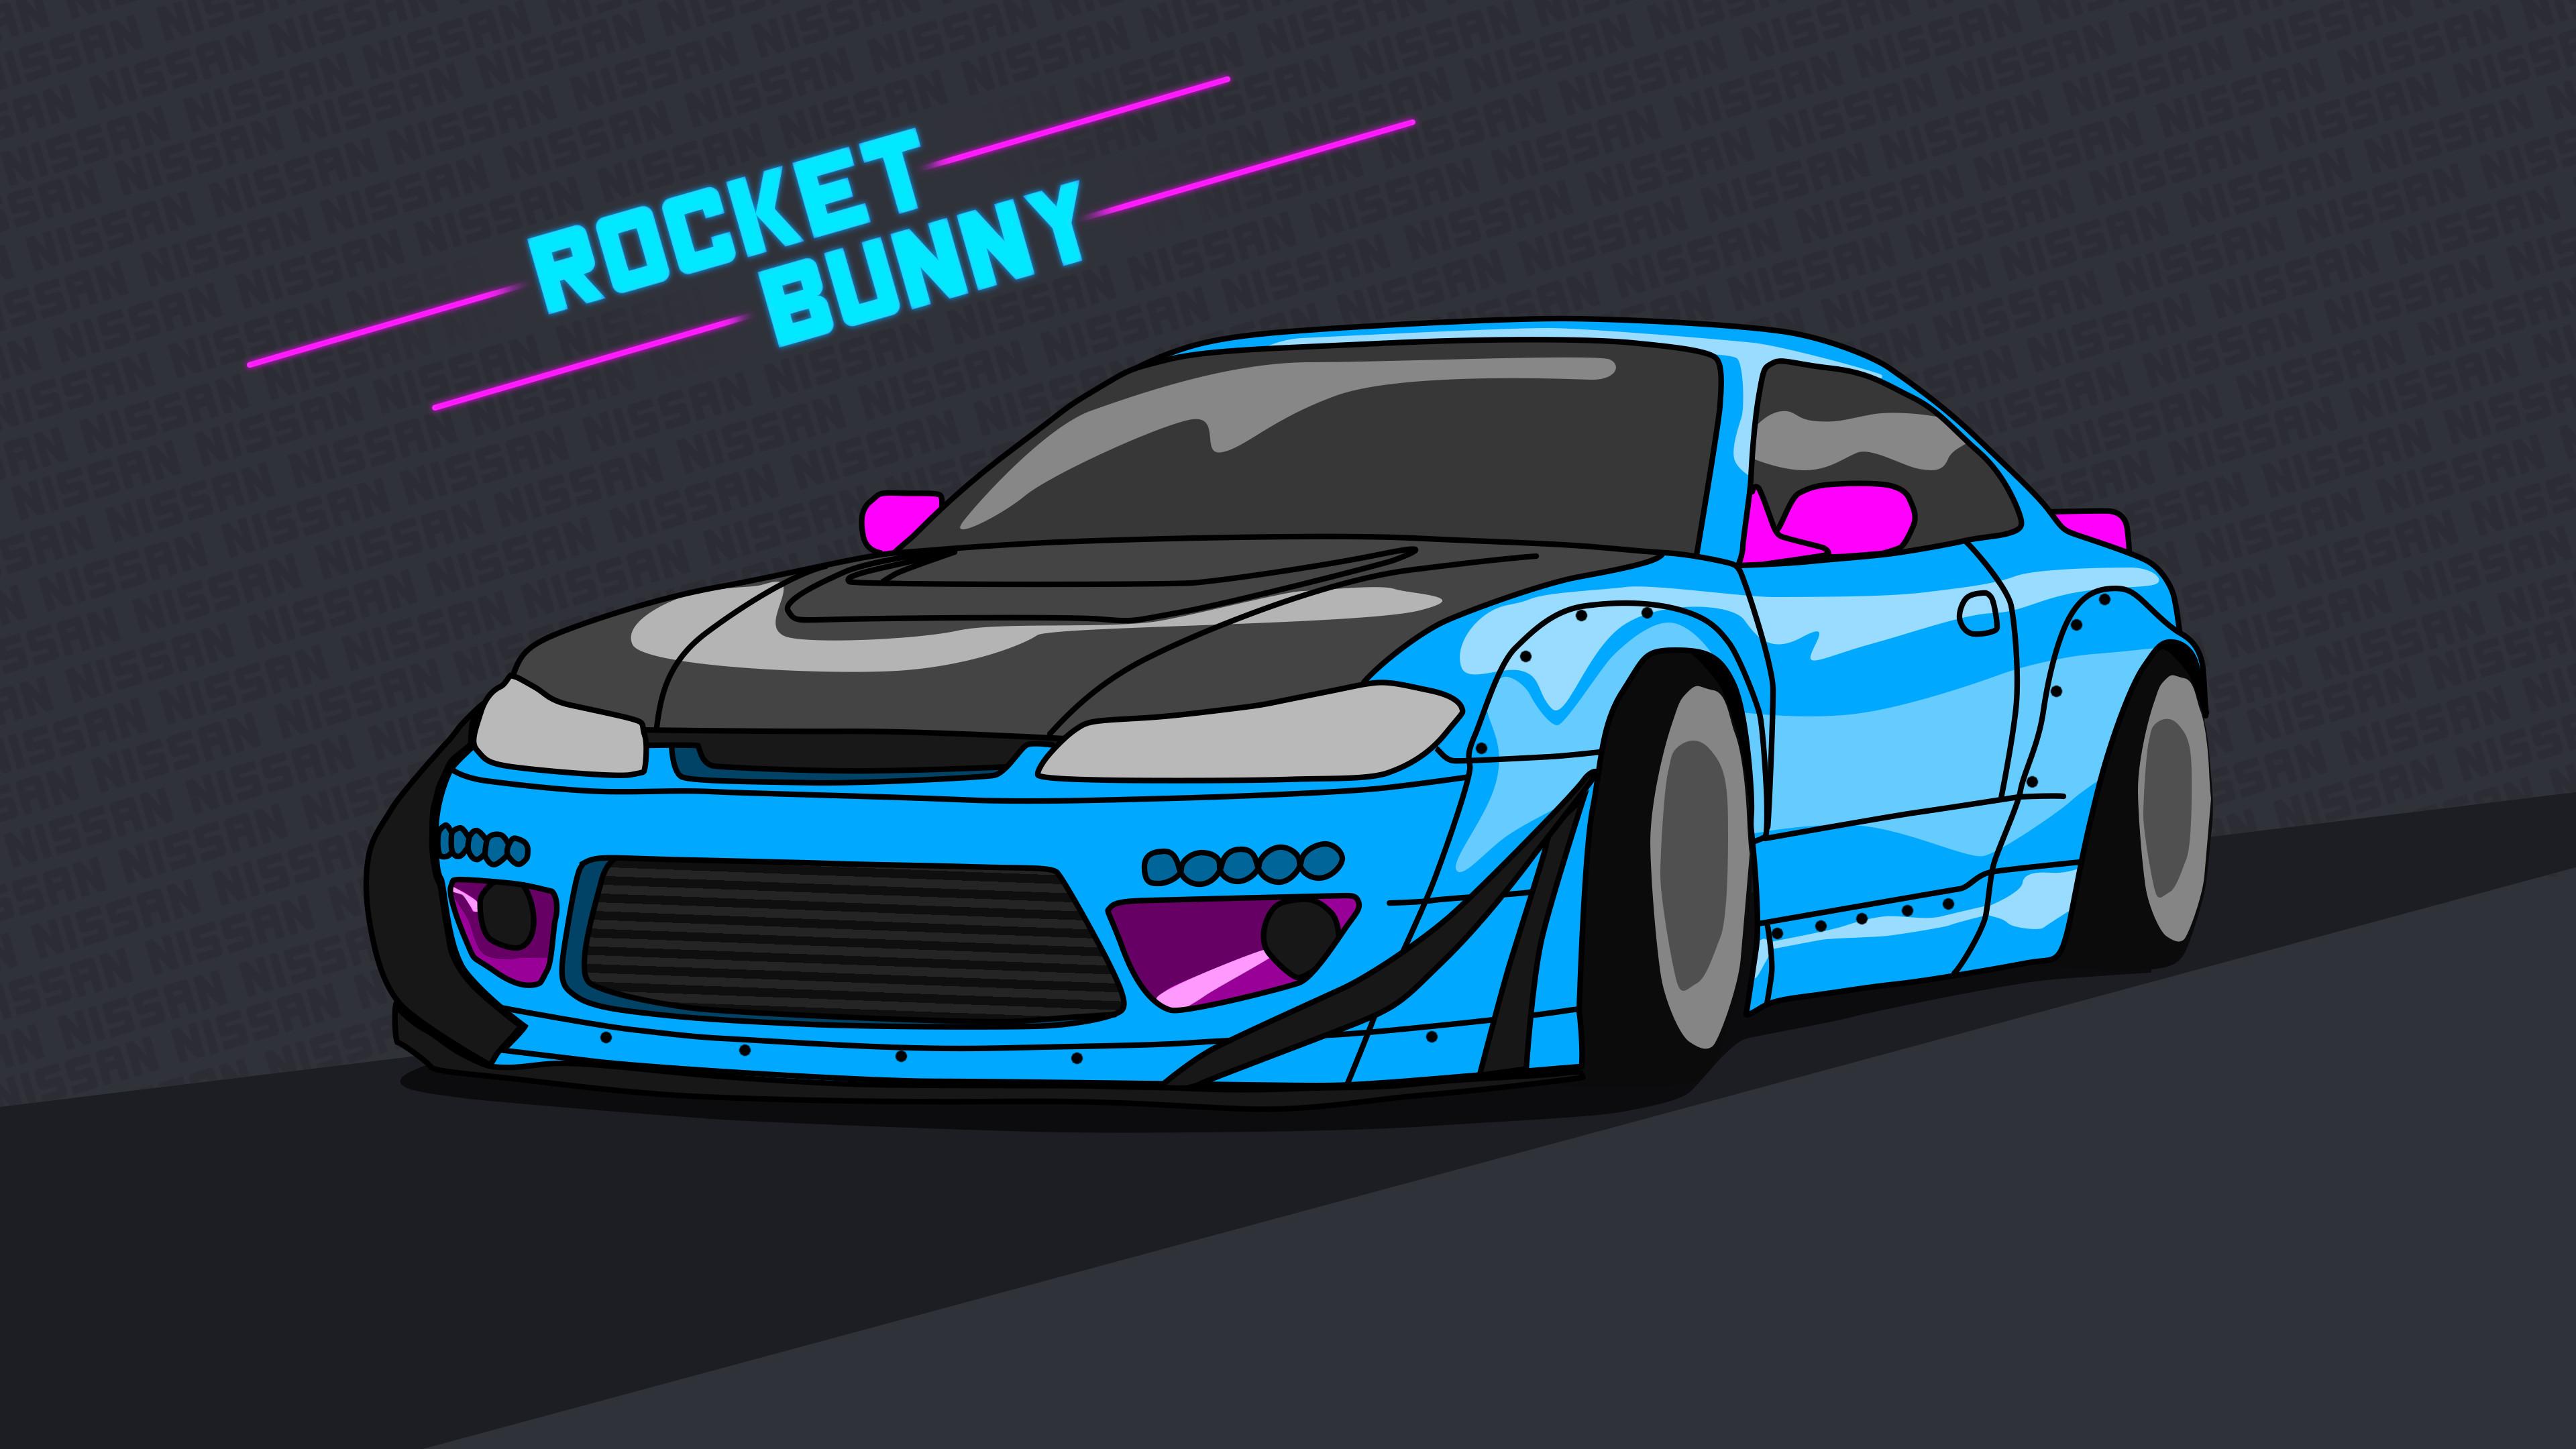 … Nissan Silvia S15 wallpaper 4k rocket bunny Neon by ItsBarney01